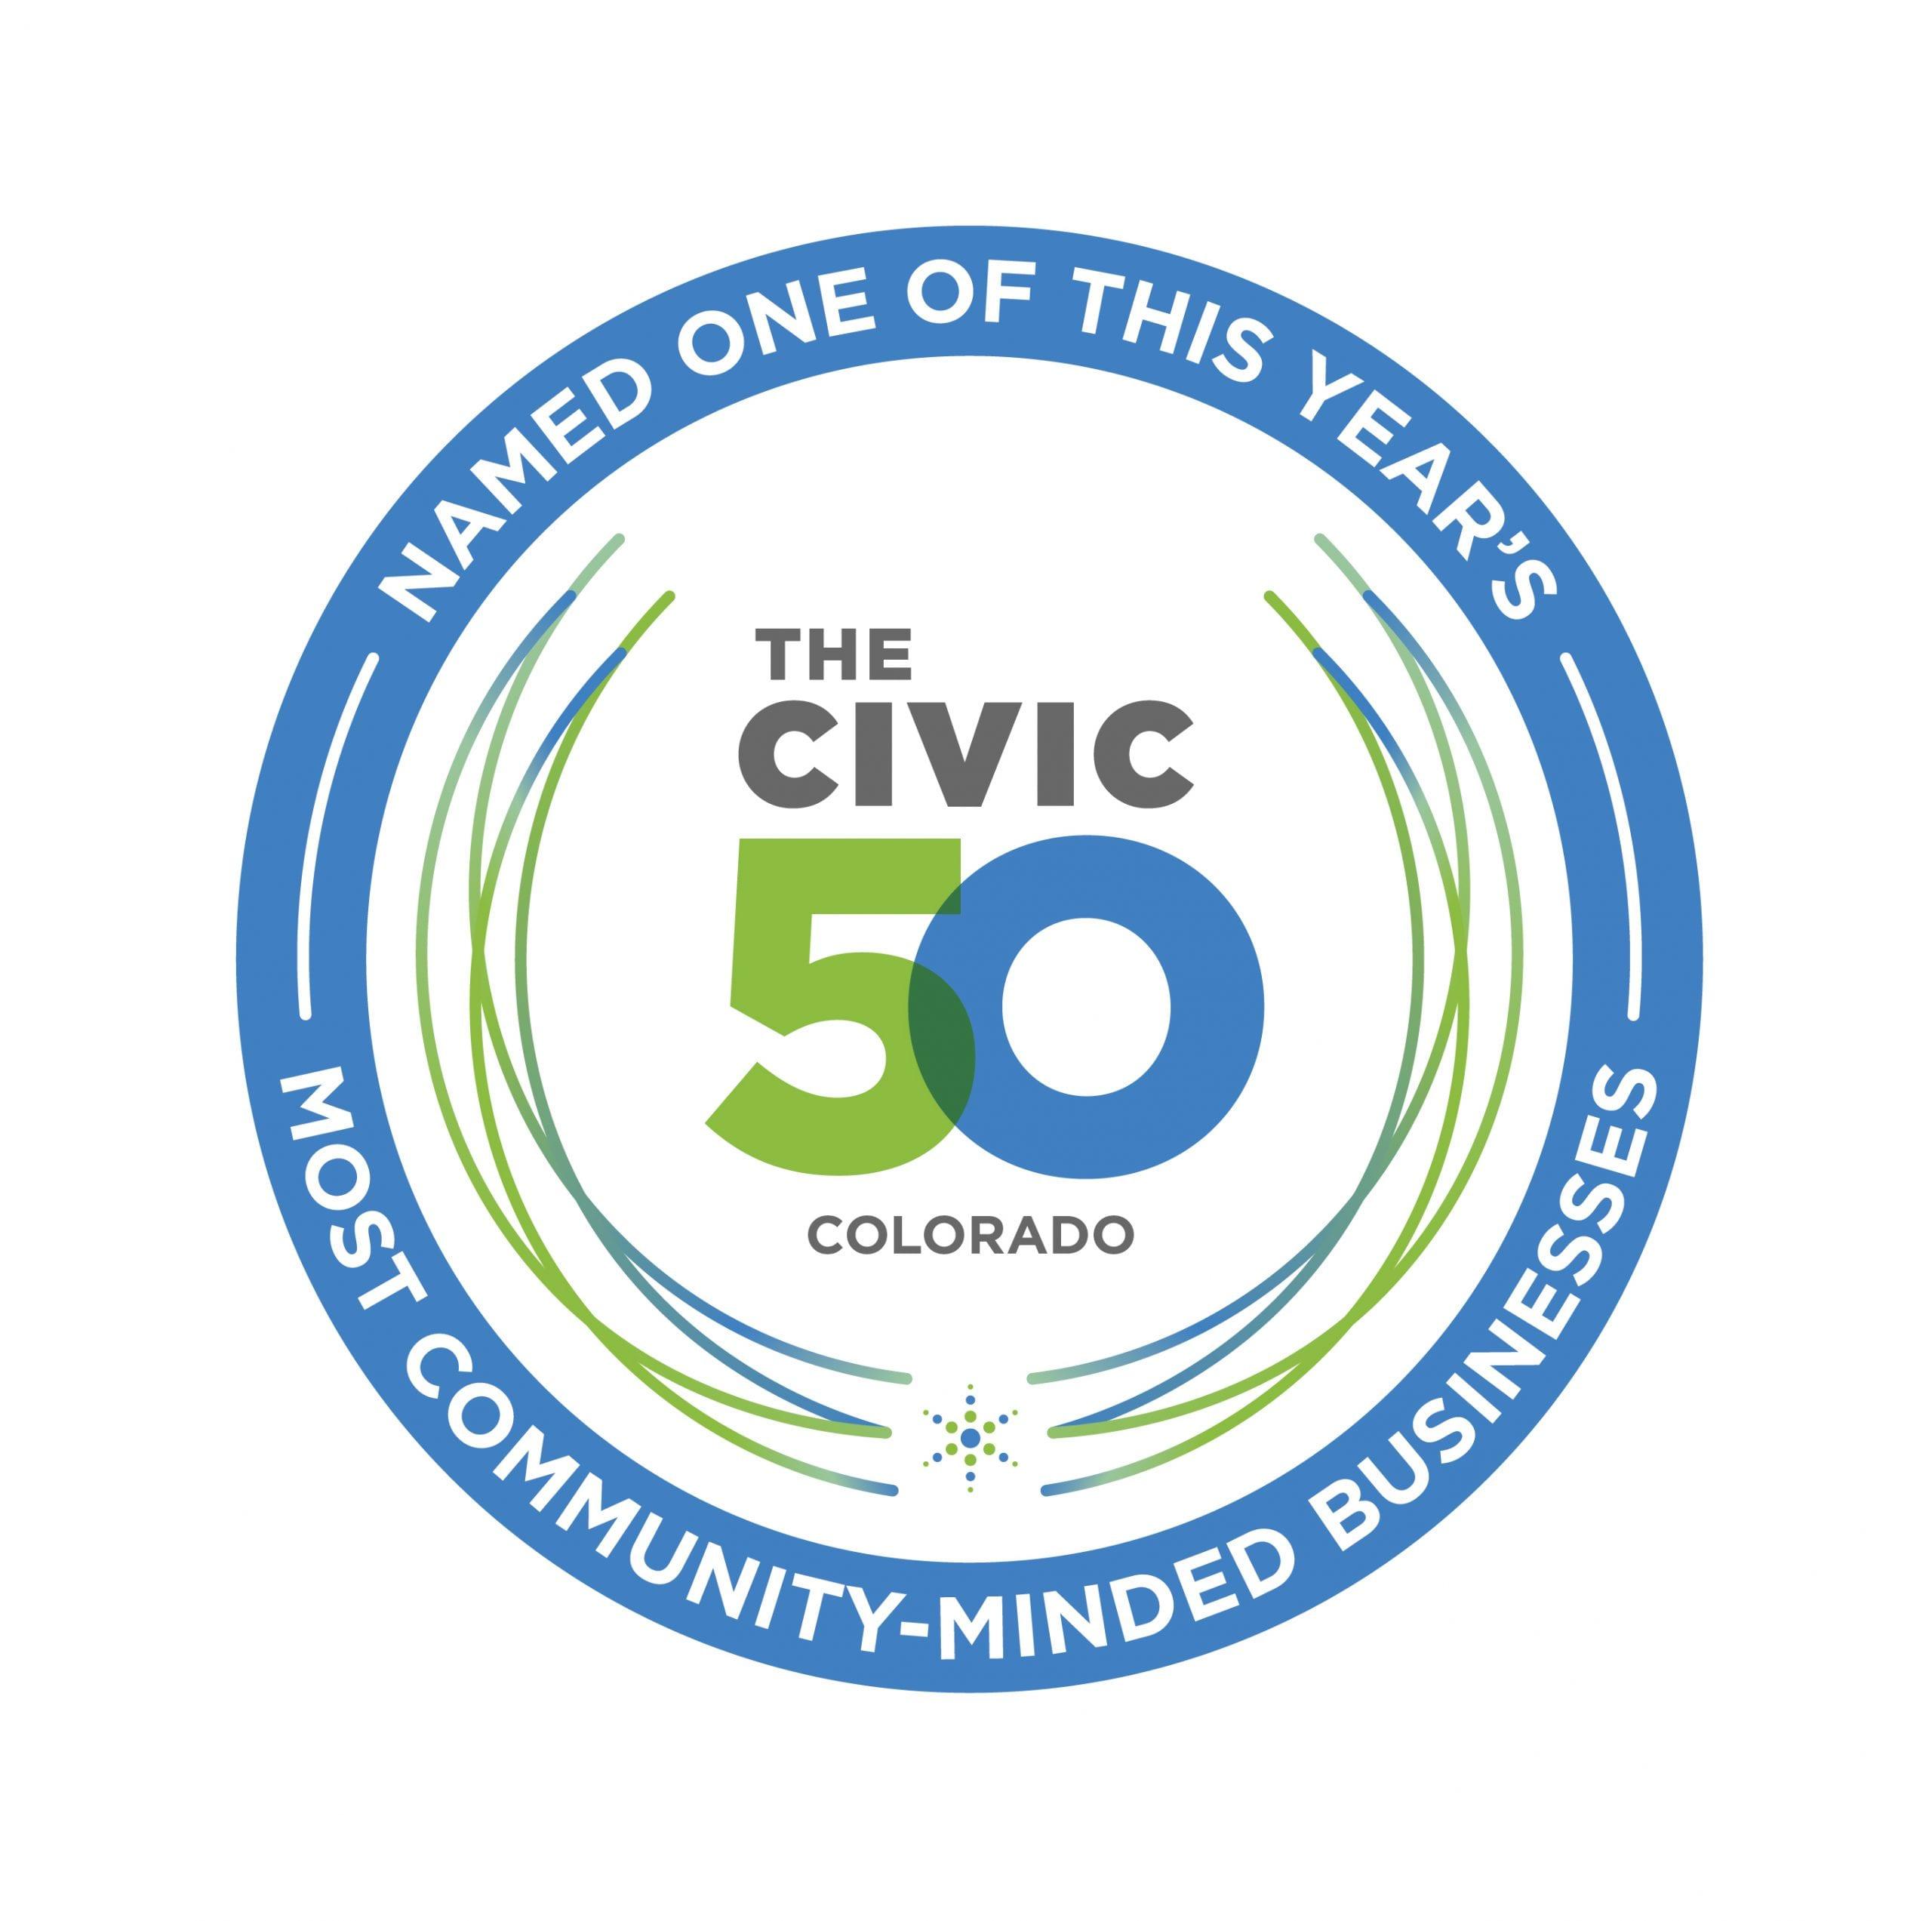 POL - The Civic 50 - Badge - Colorado